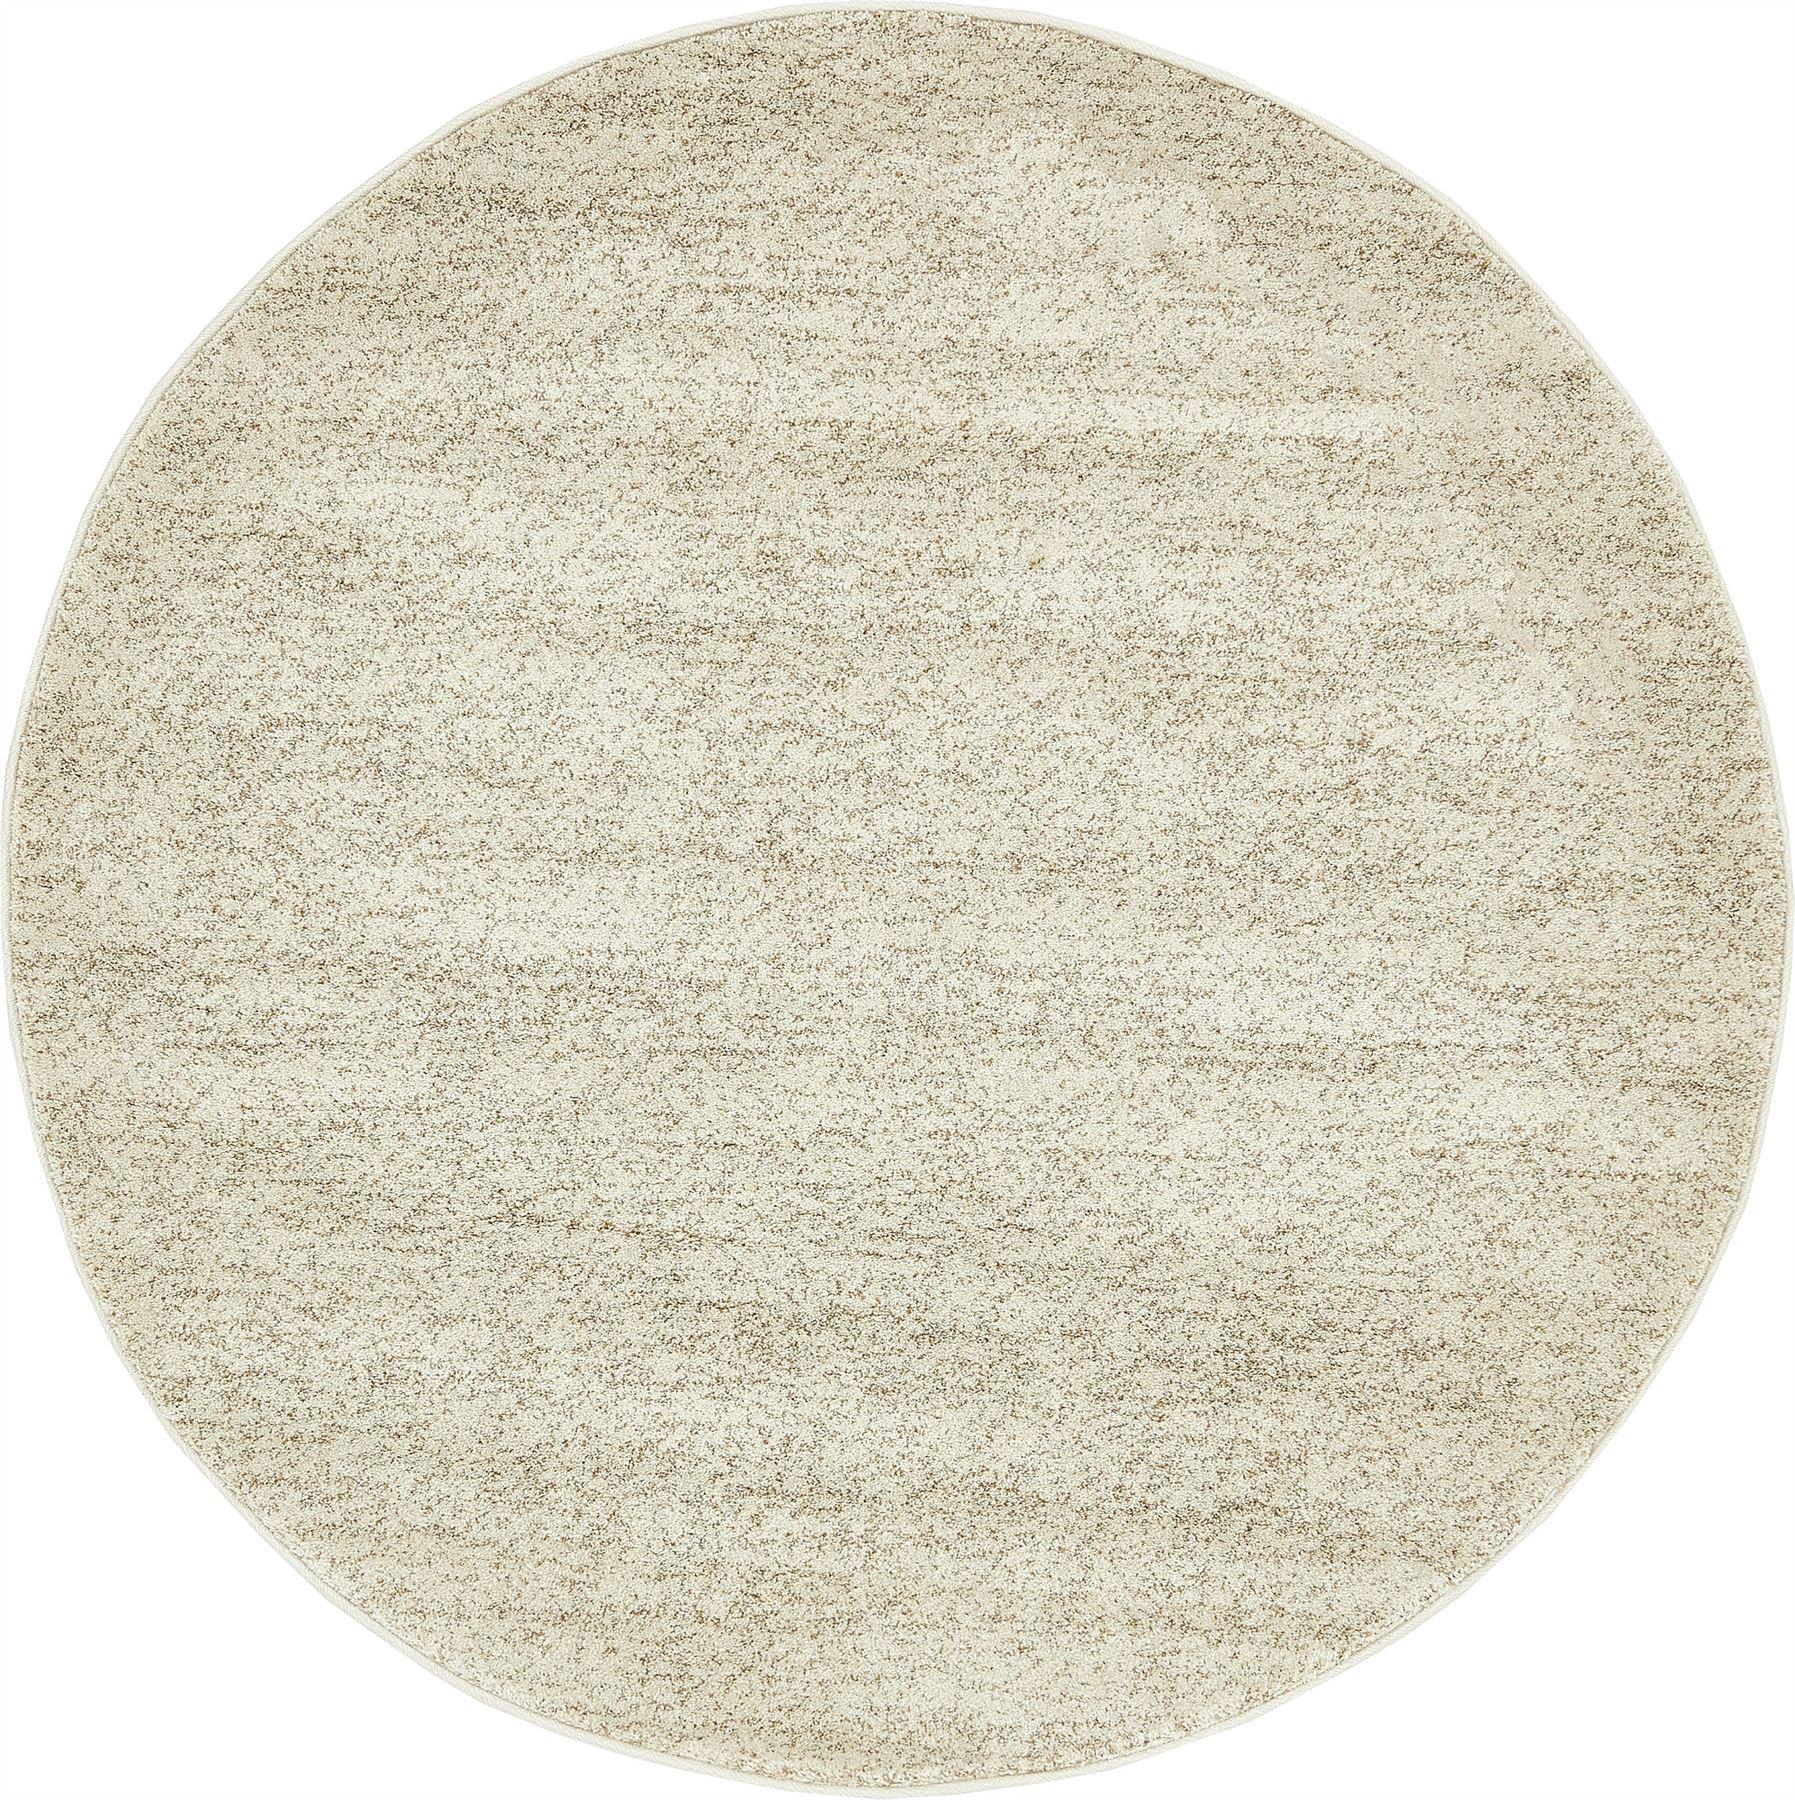 Soft Rug Plush Carpet Modern Solid Area Rug Floor Room